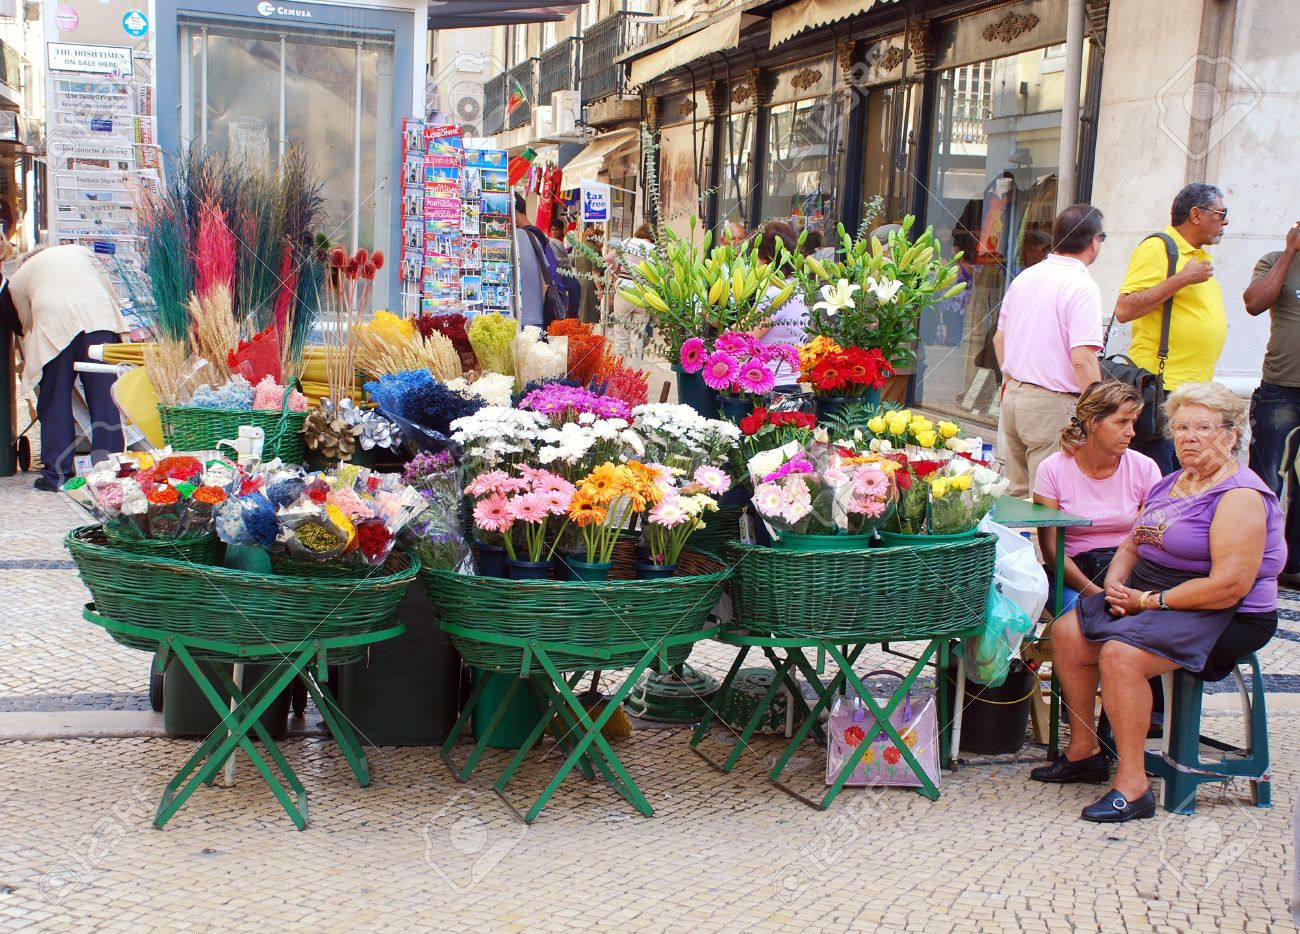 Lisbon portugal september 29 outdoor fresh flower market lisbon portugal september 29 outdoor fresh flower market from main augusta street izmirmasajfo